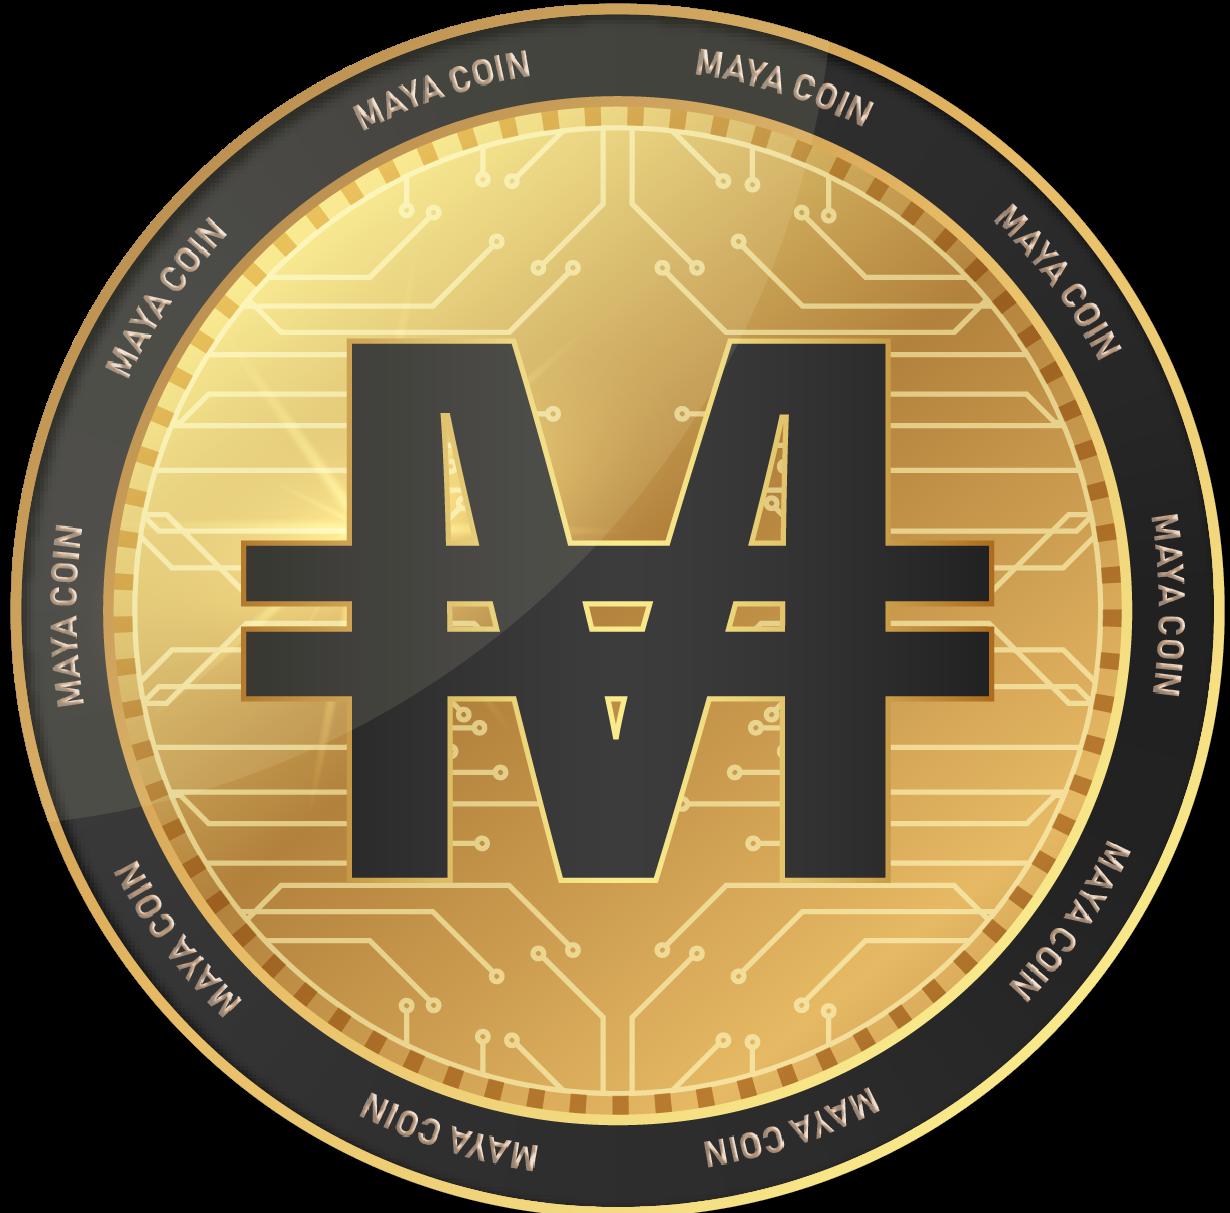 Maya Coin owns 125 million Maya Preferred 223 tokens, making it worth half the booking value of Maya preferred 223